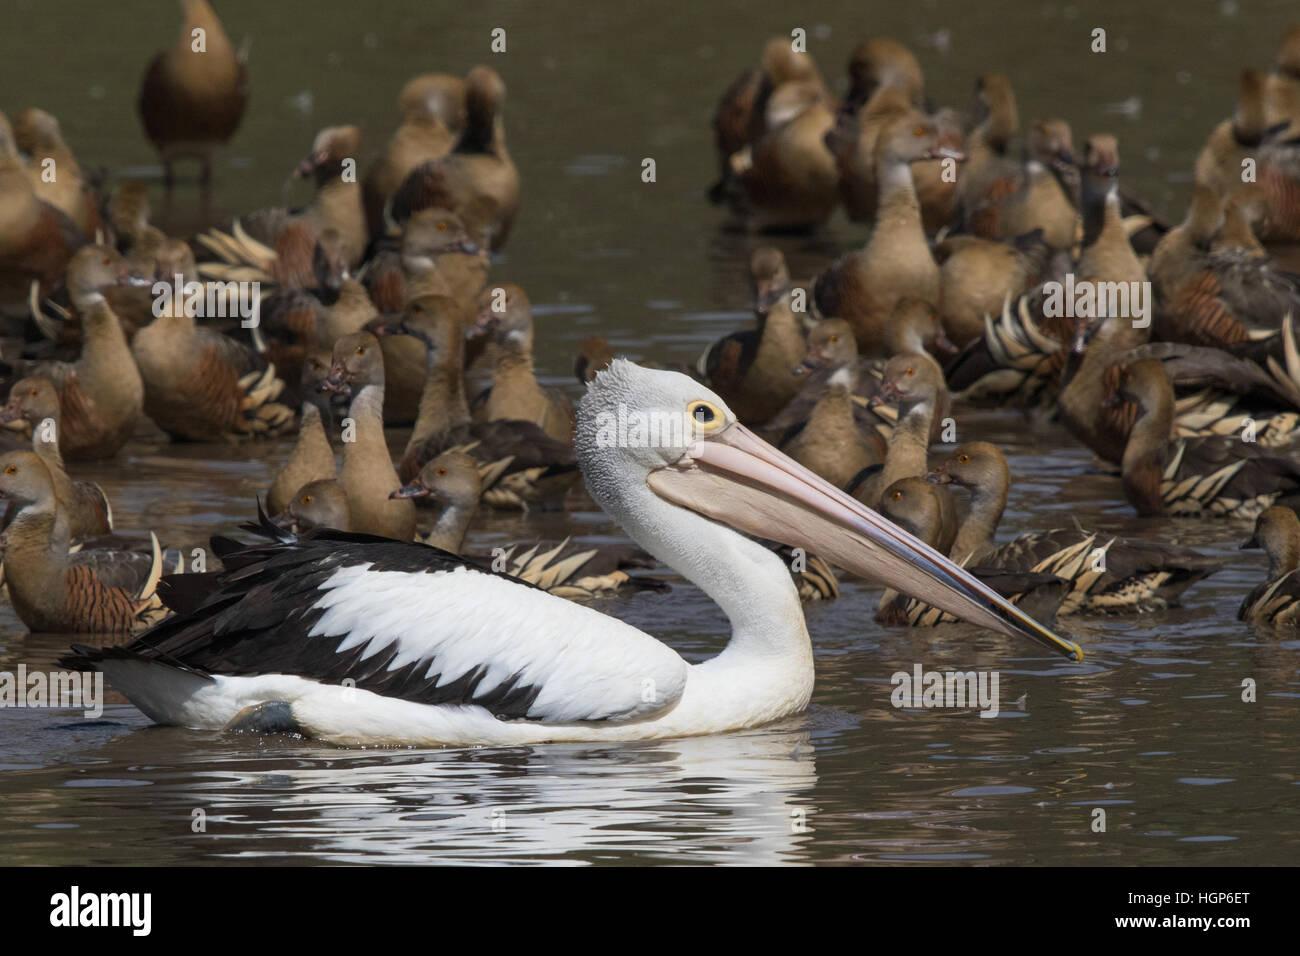 Australian Pelican (Pelecanus conspicillatus) swimming amongst a flock of Plumed Whistling-ducks (Dendrocygna arcuata) Stock Photo